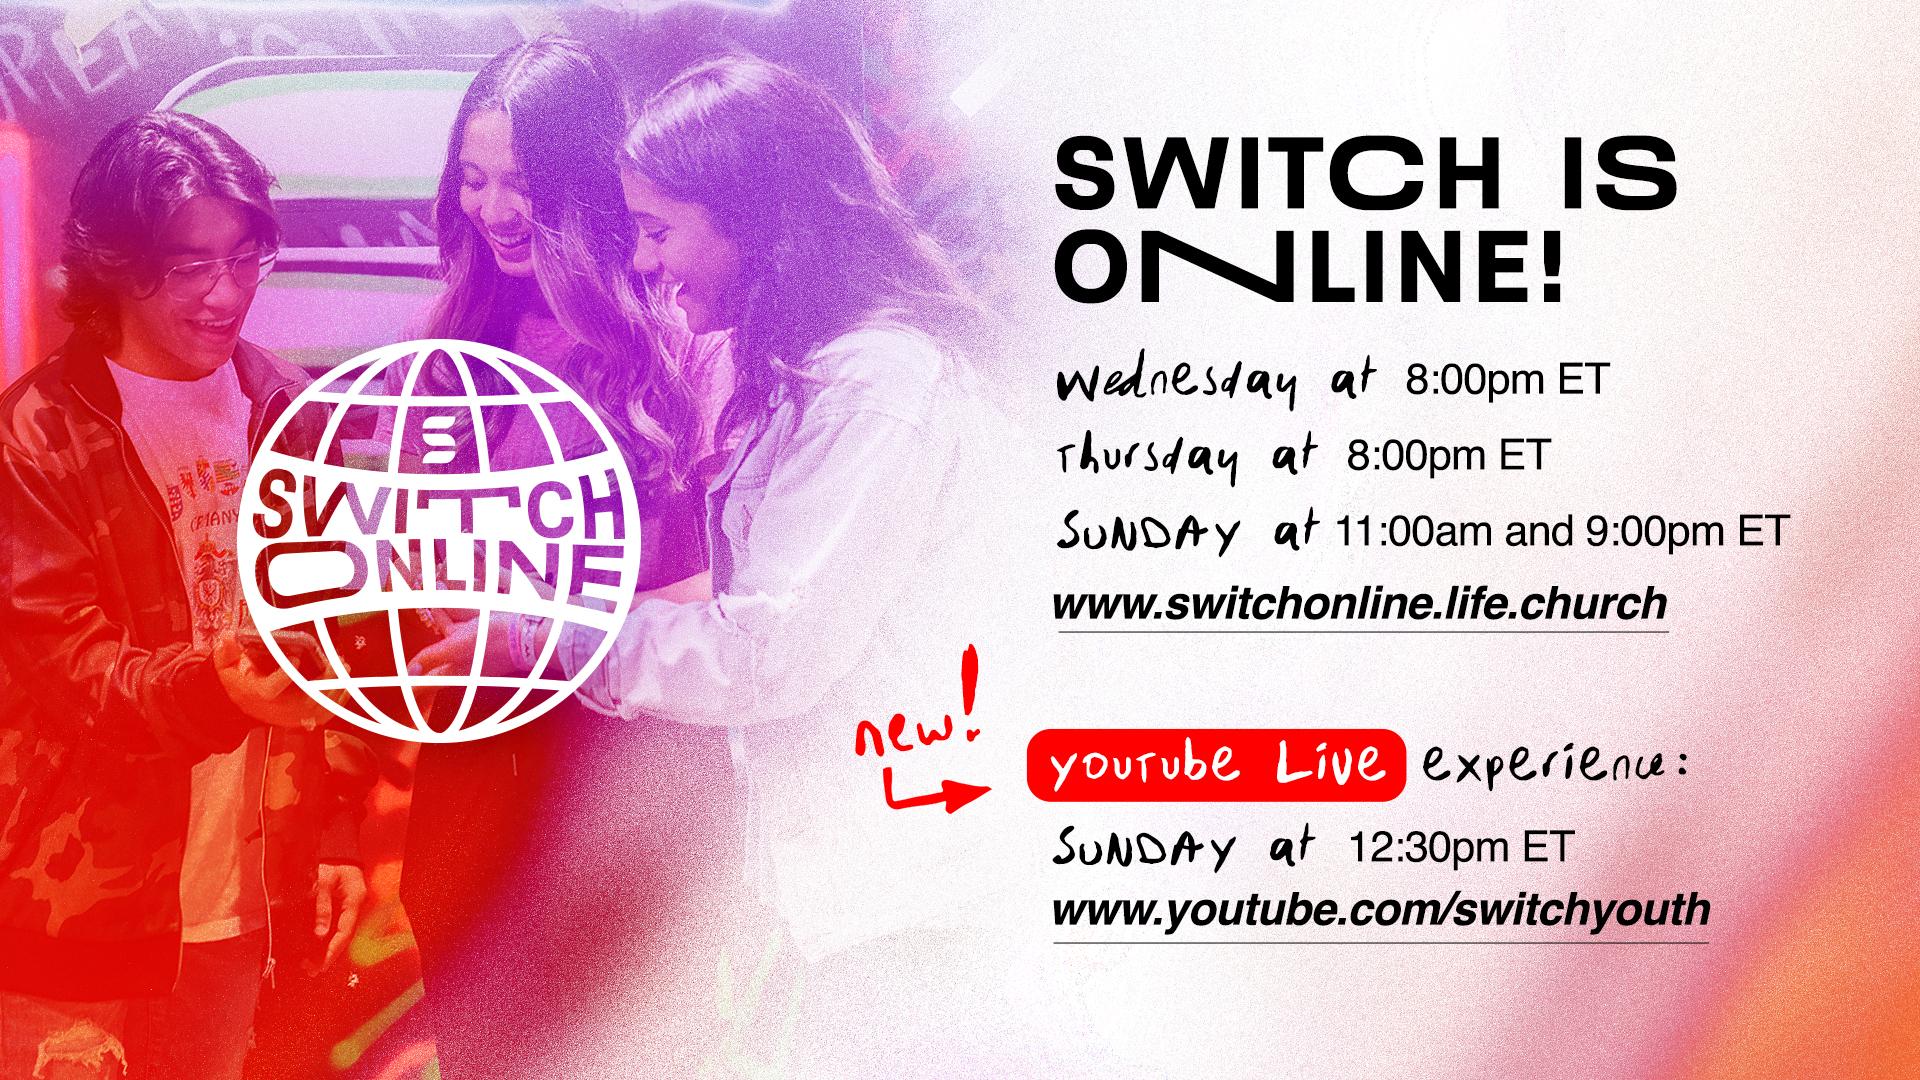 Switch Online Times 1080 - ET 2 (JPG)